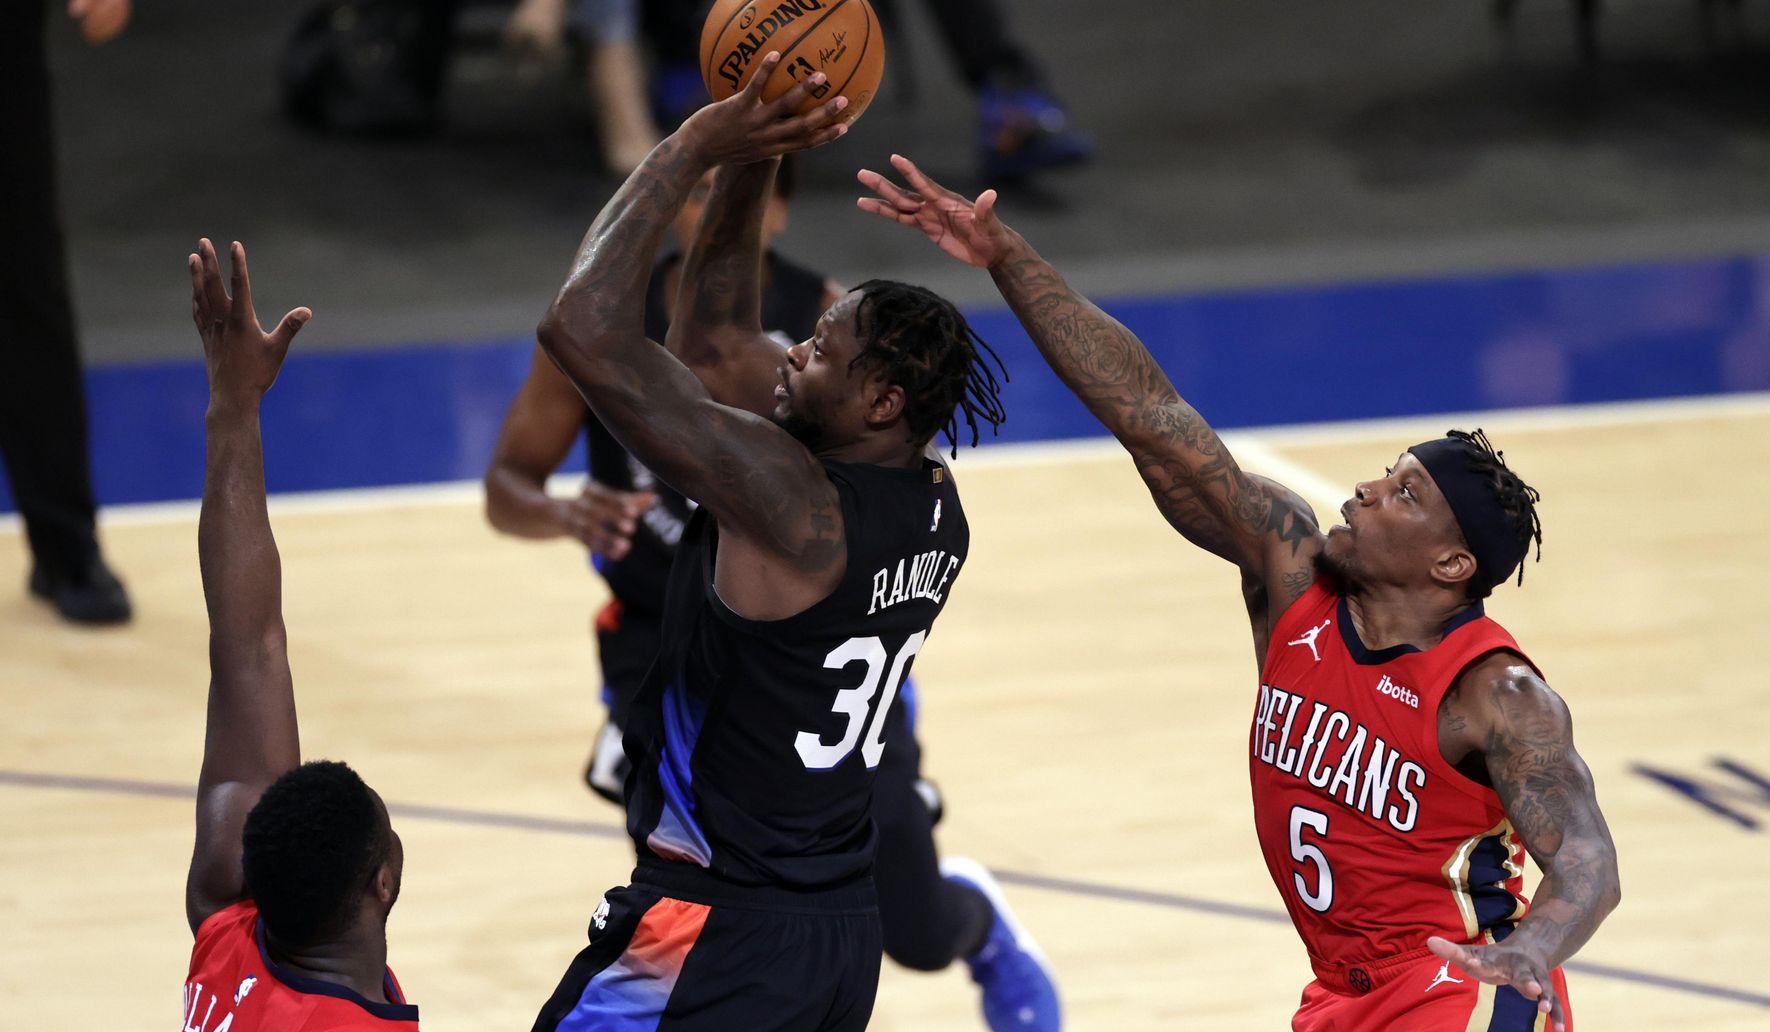 Pelicans_knicks_basketball_62989_c0-174-4164-2601_s1770x1032